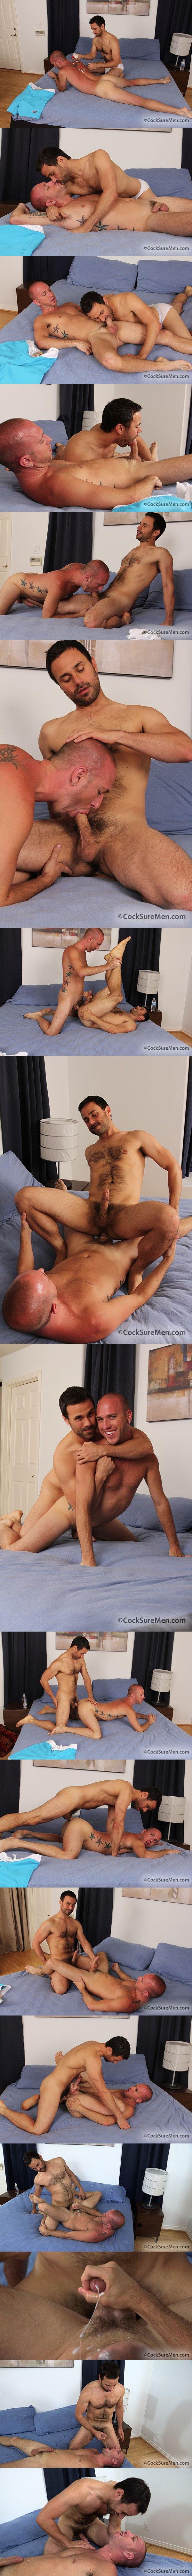 hot Rex Roddick and handsome Conner Habib flip-flop fucking at Cocksuremen 02